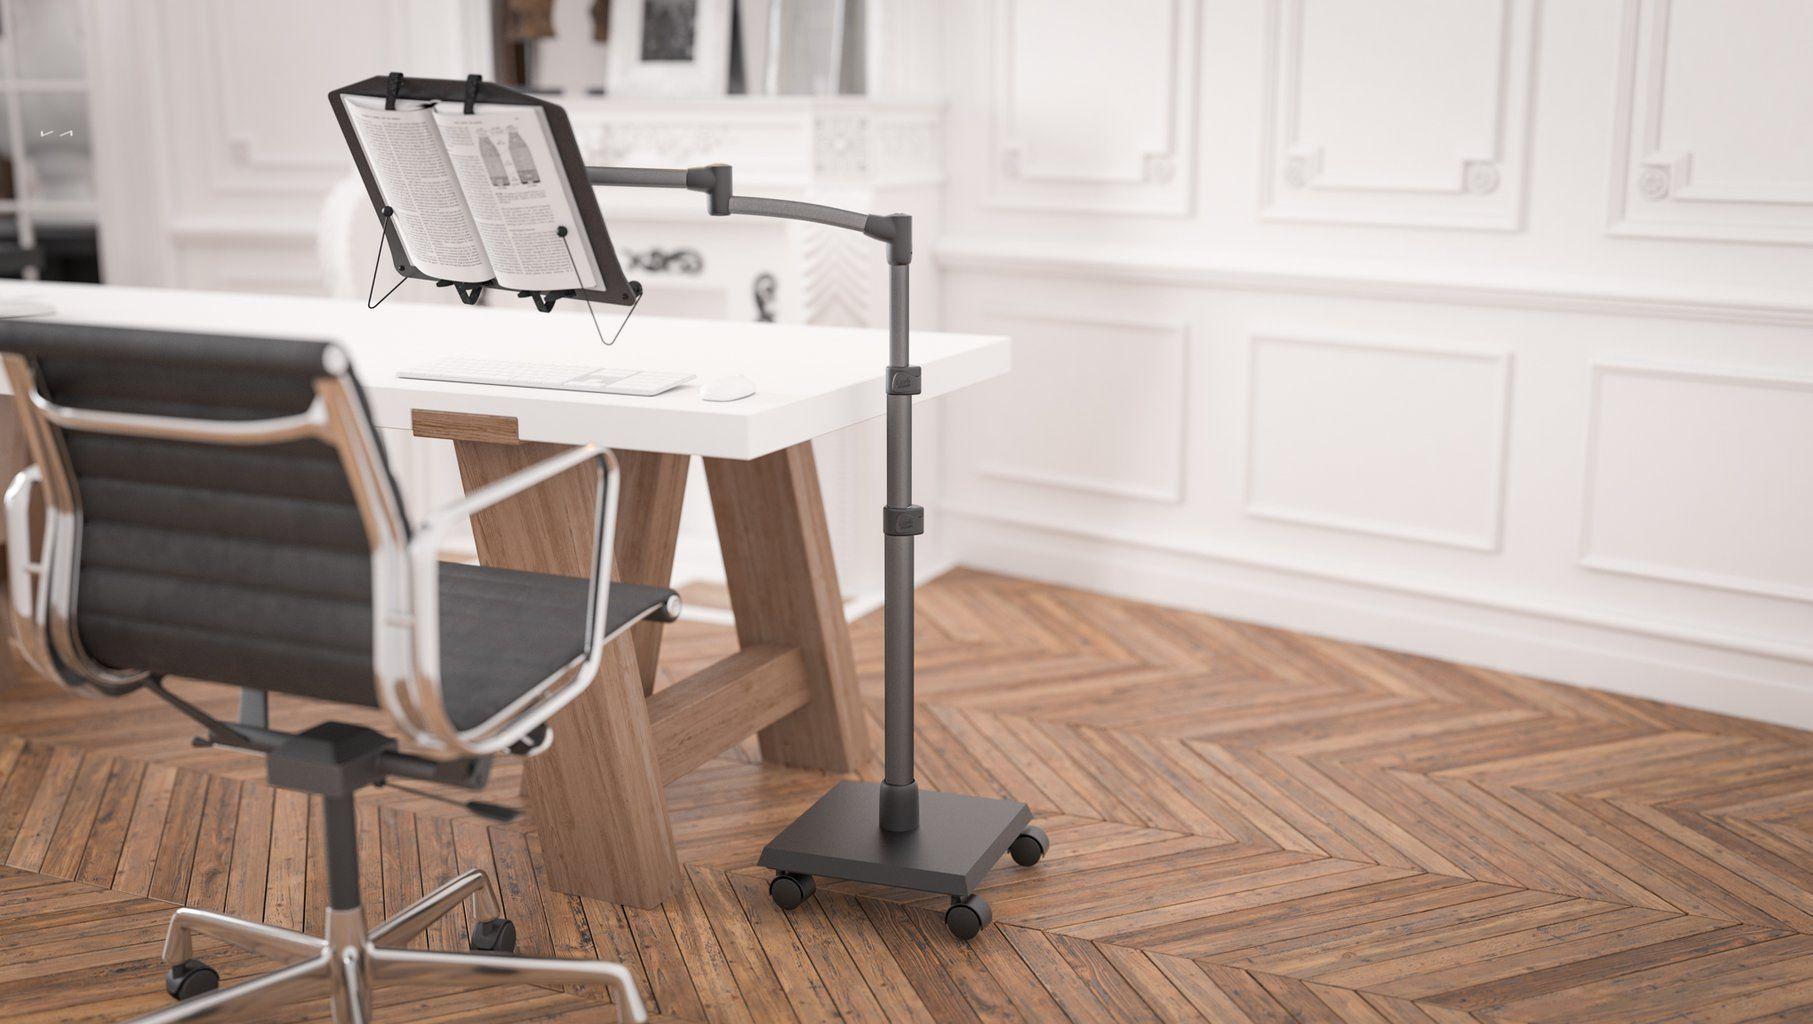 LEVO G2 Book Holder Floor Stand Book holders, Flooring